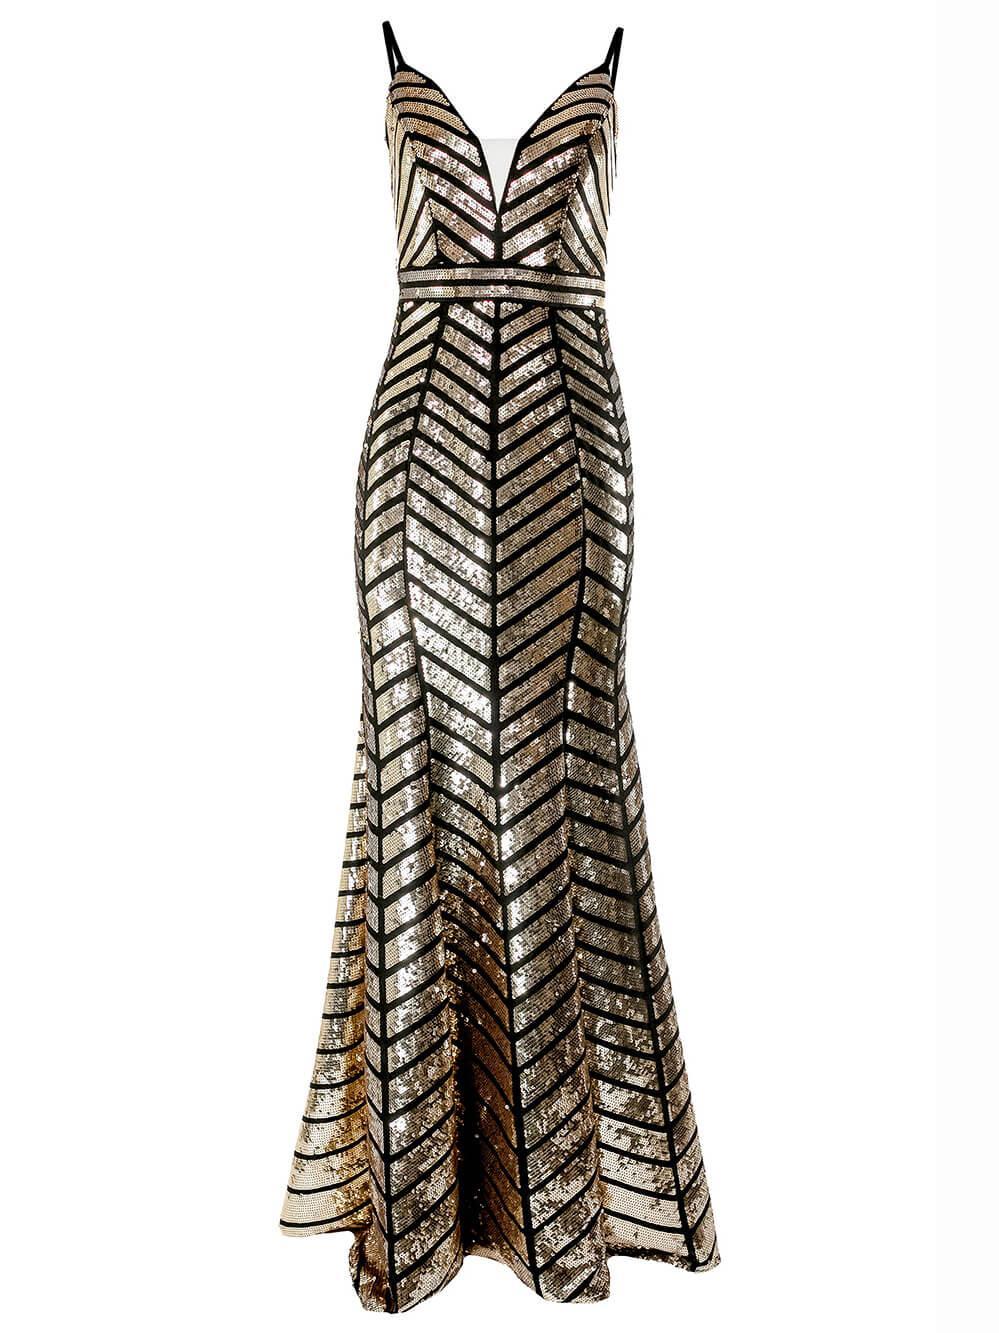 Sleeveless Sequin Chevron Print Gown Item # 2244